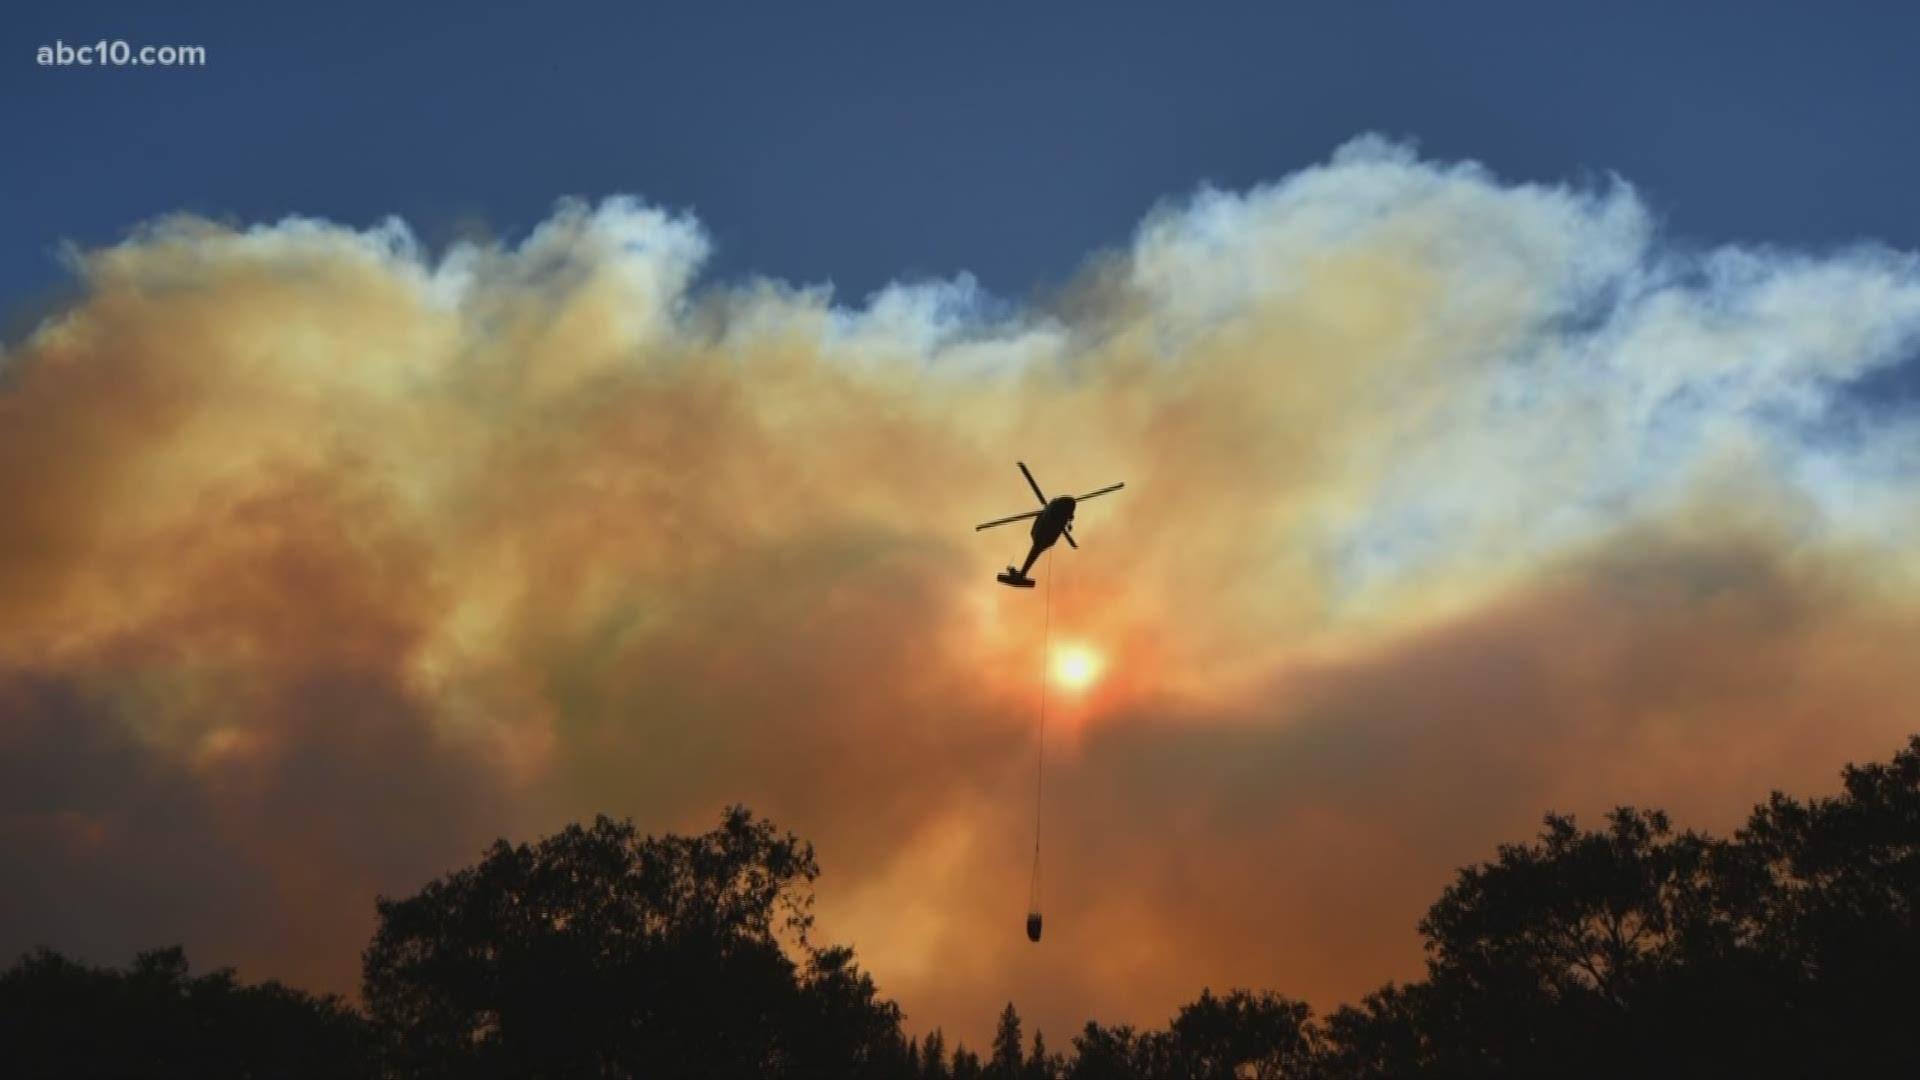 rain helps douse california fire but slows search crews wzzm13 com wzzm13 com